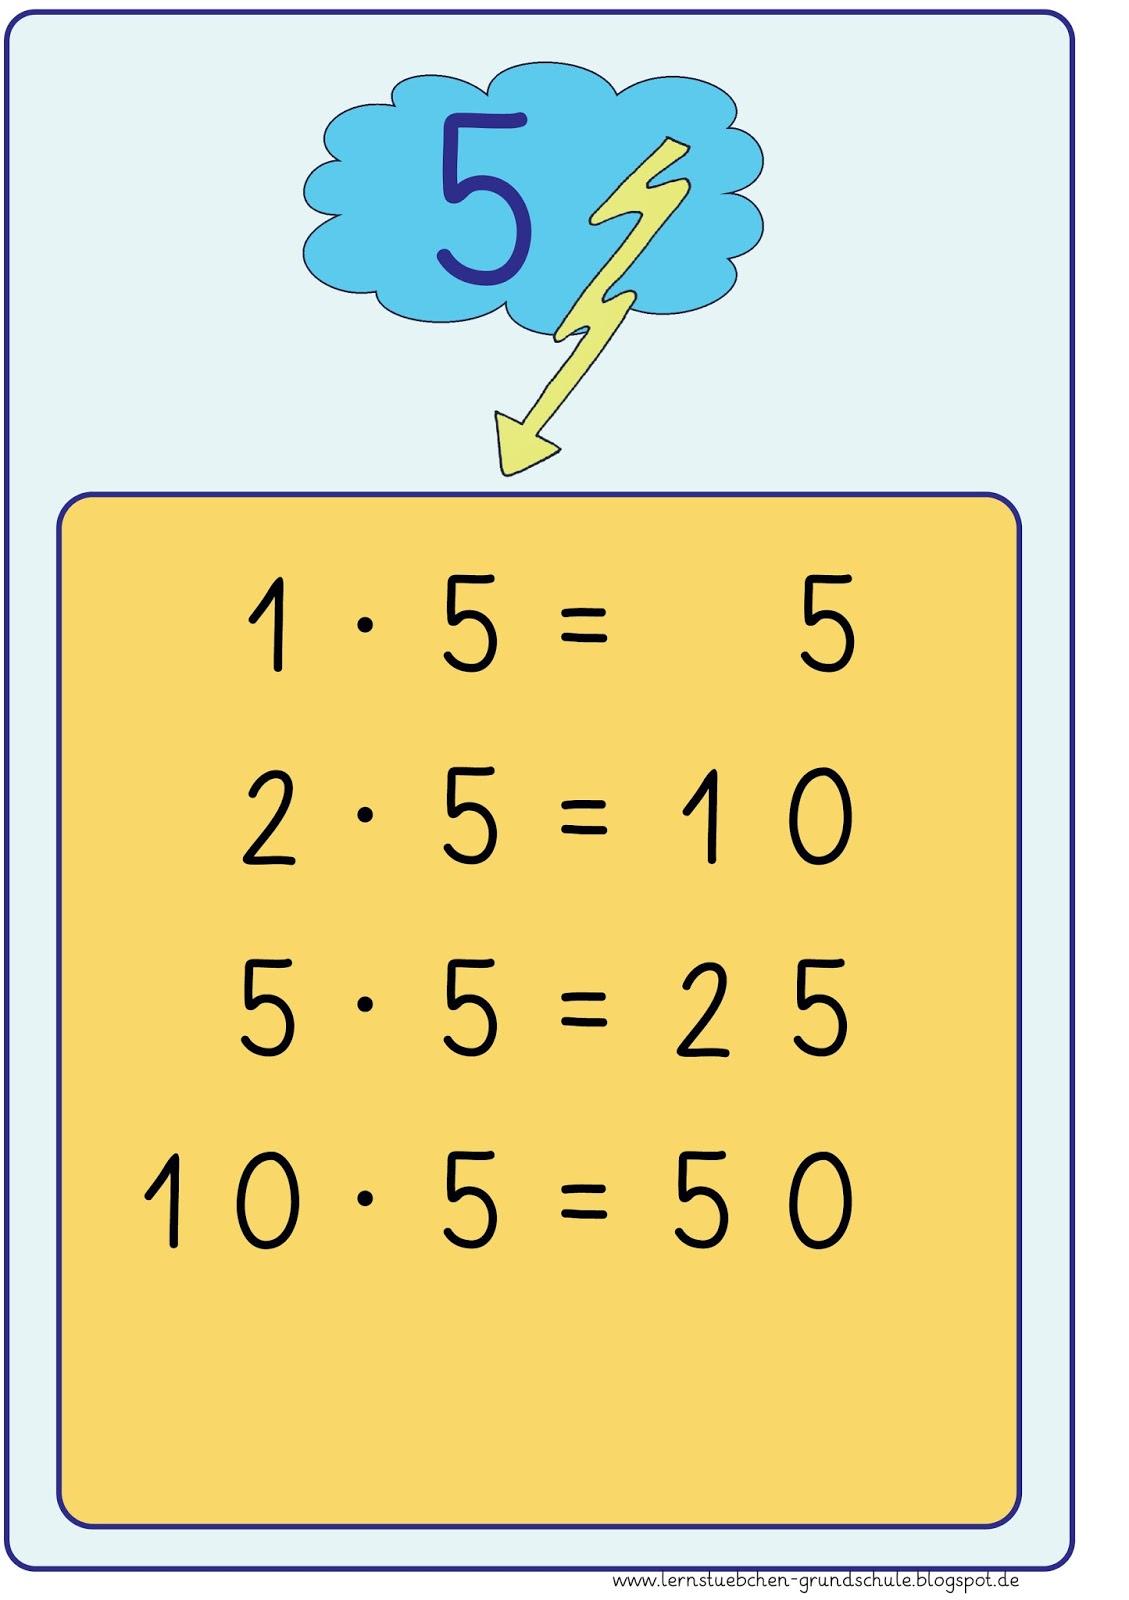 arbeitsblatt vorschule 187 kernaufgaben mathe kostenlose